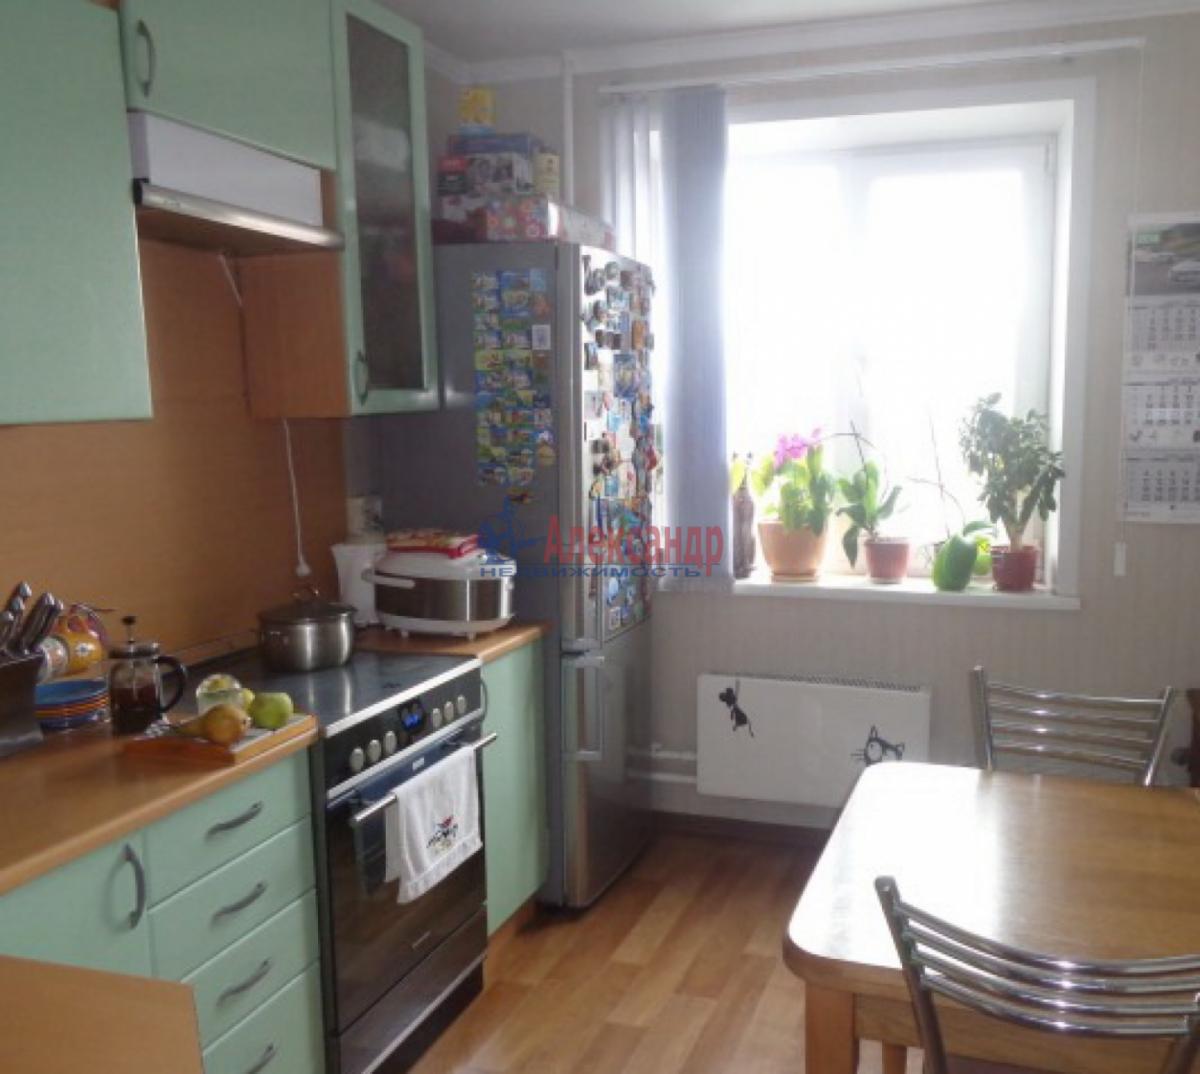 2-комнатная квартира (54м2) в аренду по адресу Ветеранов пр., 122— фото 3 из 5